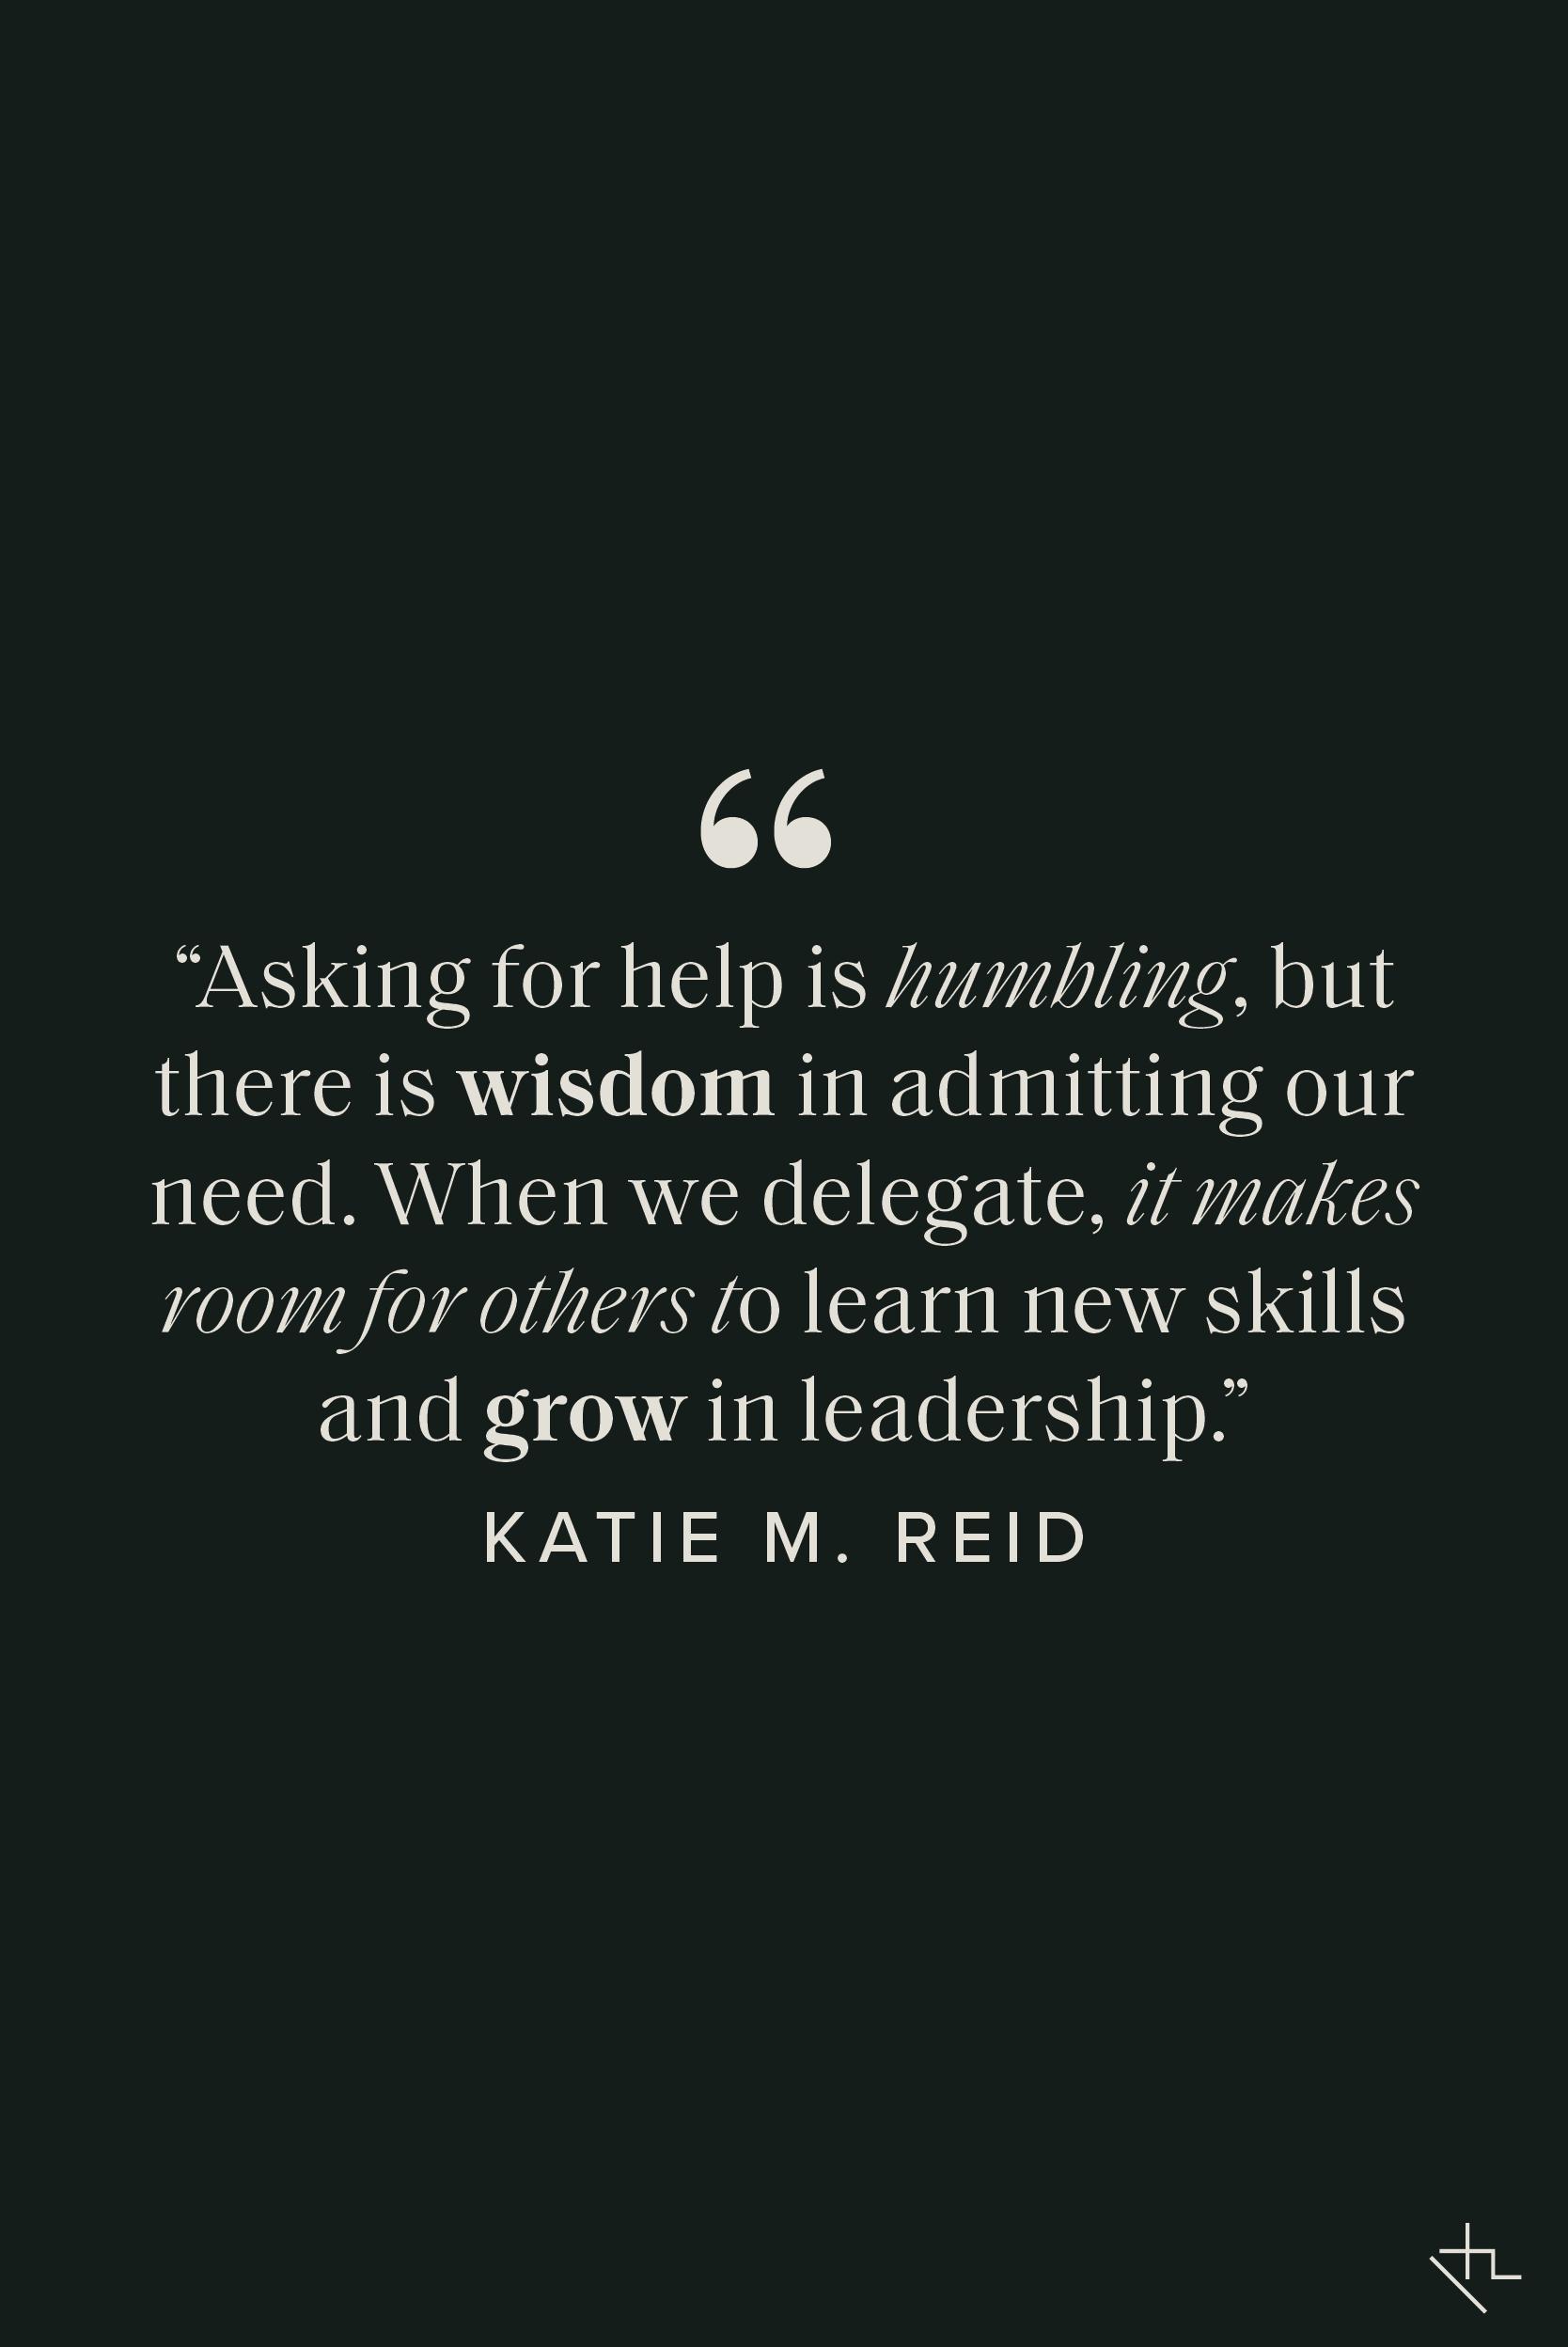 Katie M. Reid- Pinterest Image